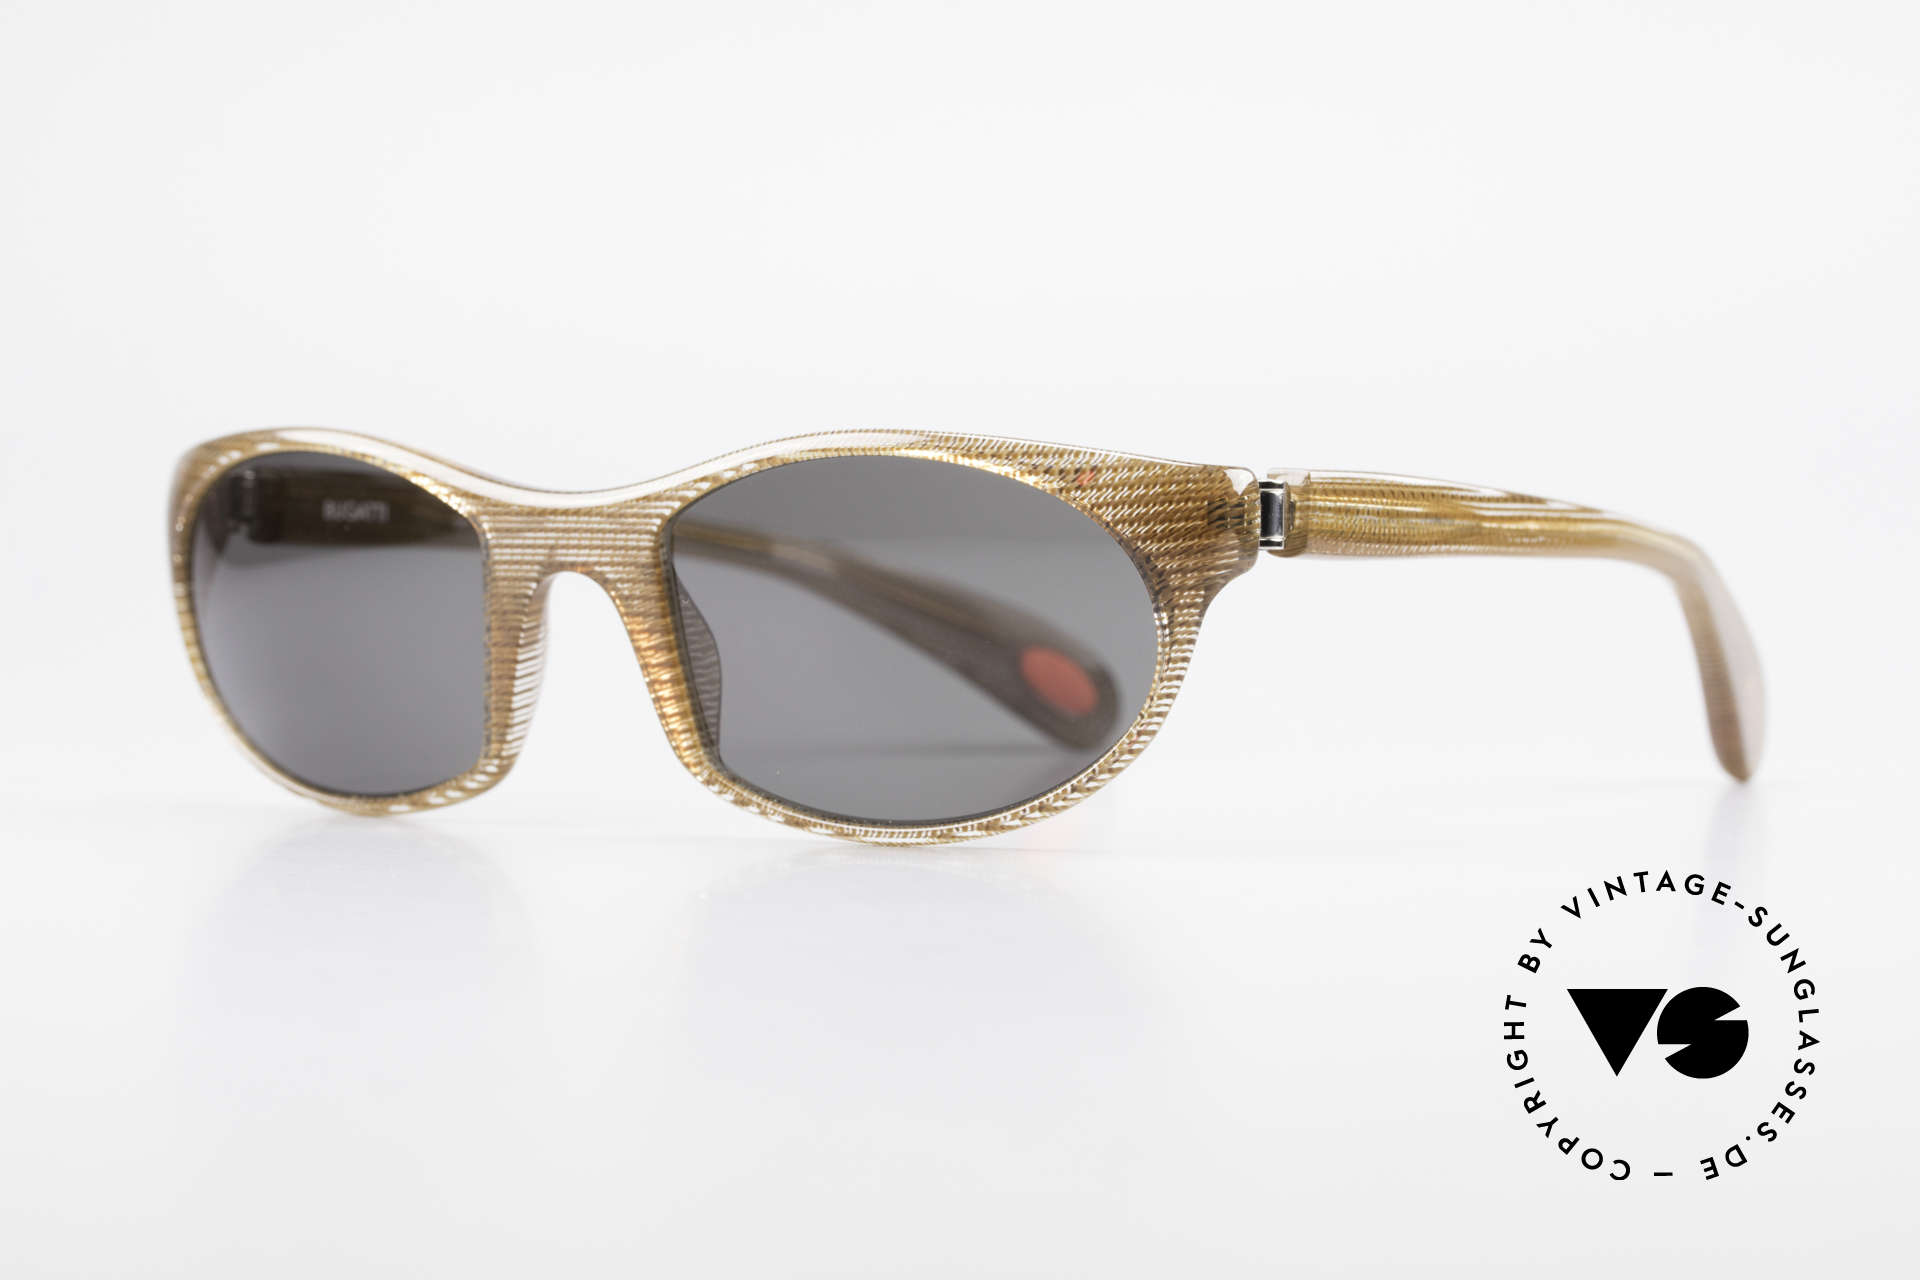 Bugatti 328 Odotype Rare Men's Designer Sunglasses, ergonomic frame with 180°-spring hinges!, Made for Men